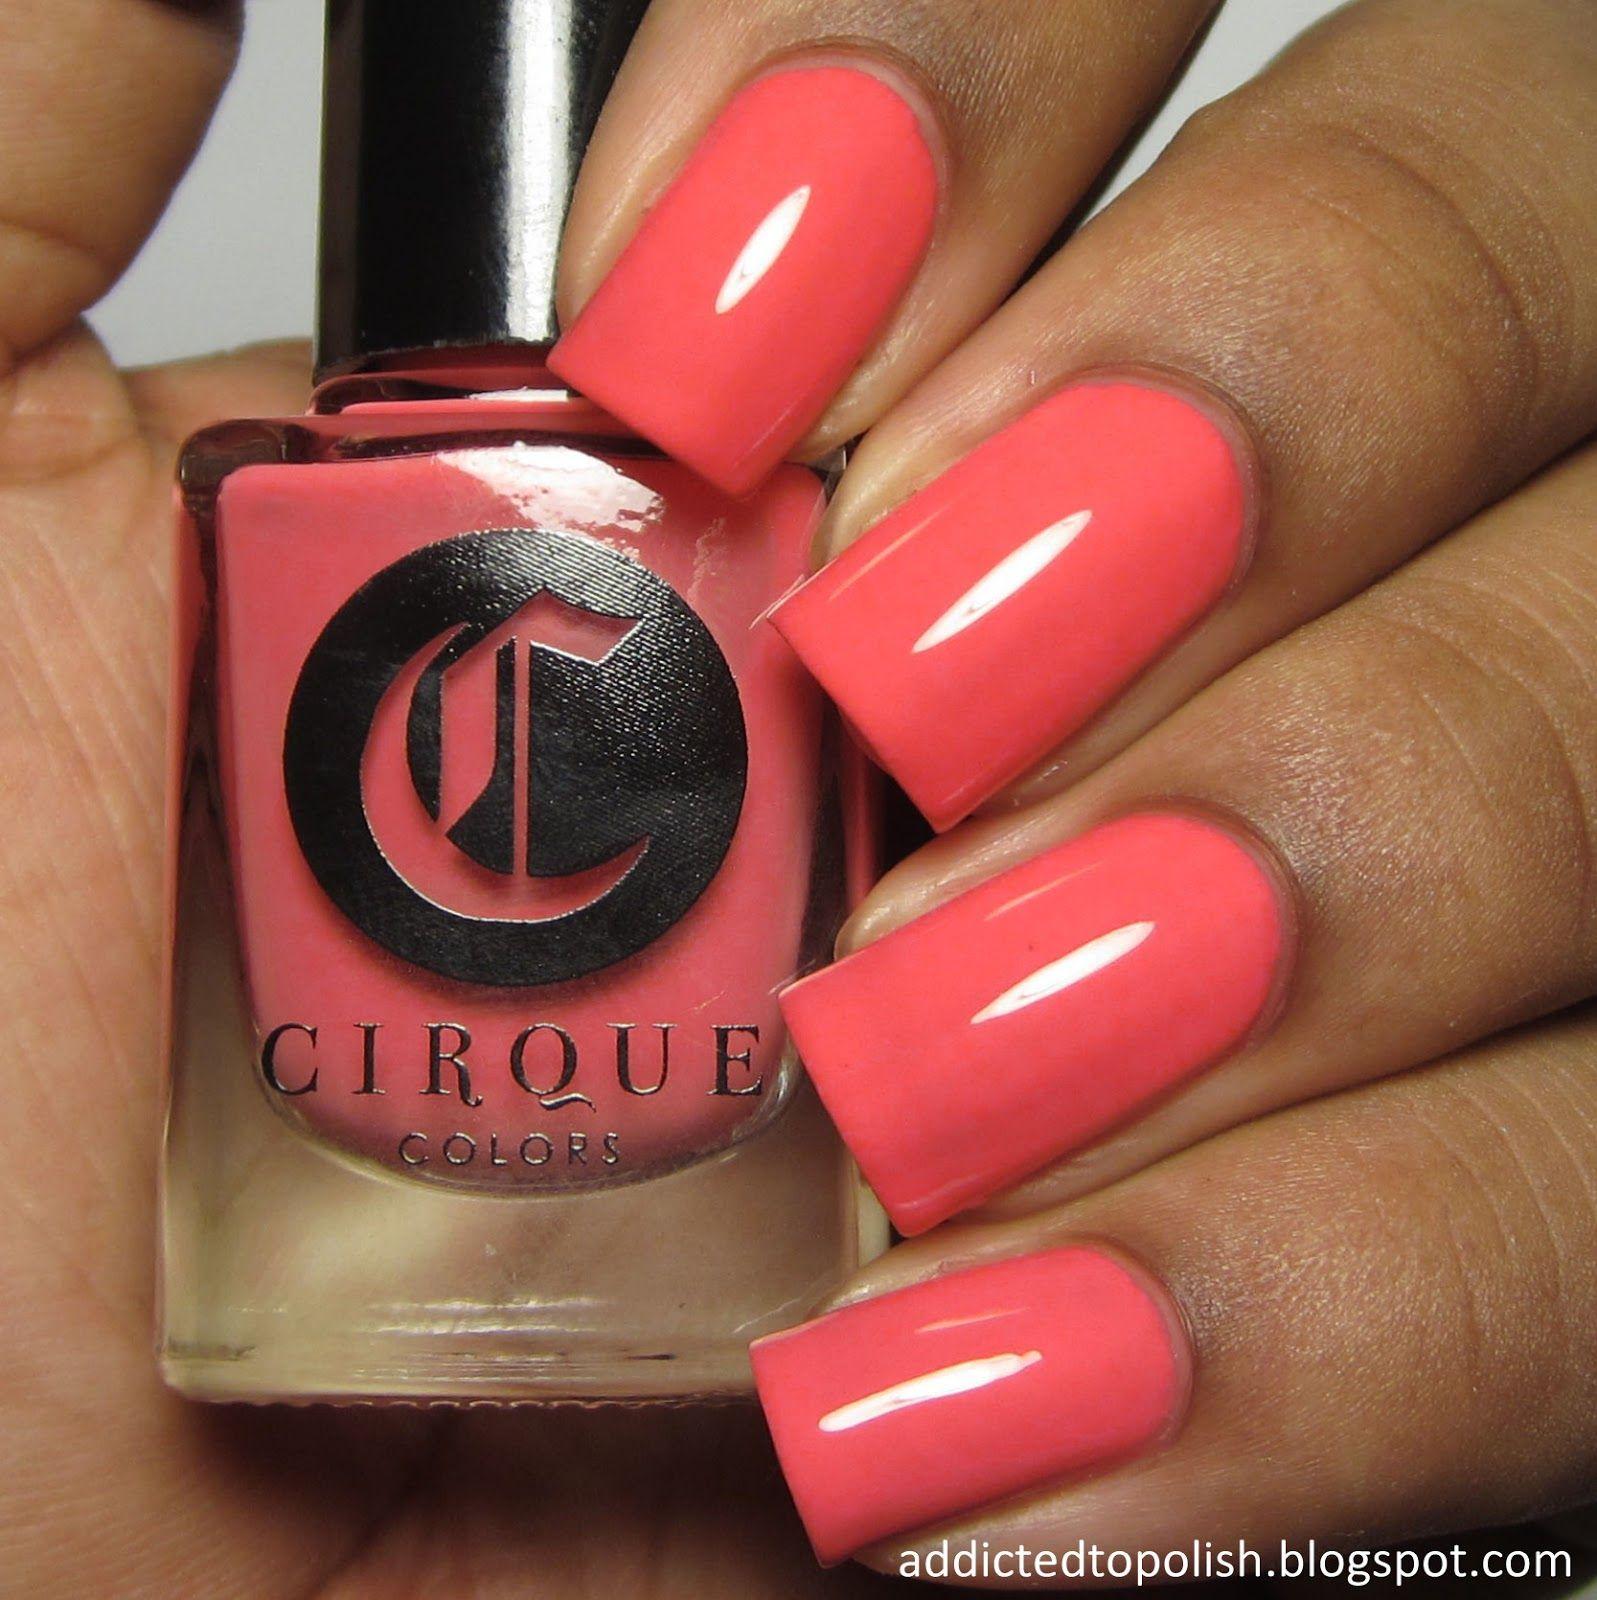 Cirque colors metropolis collection for april 2015